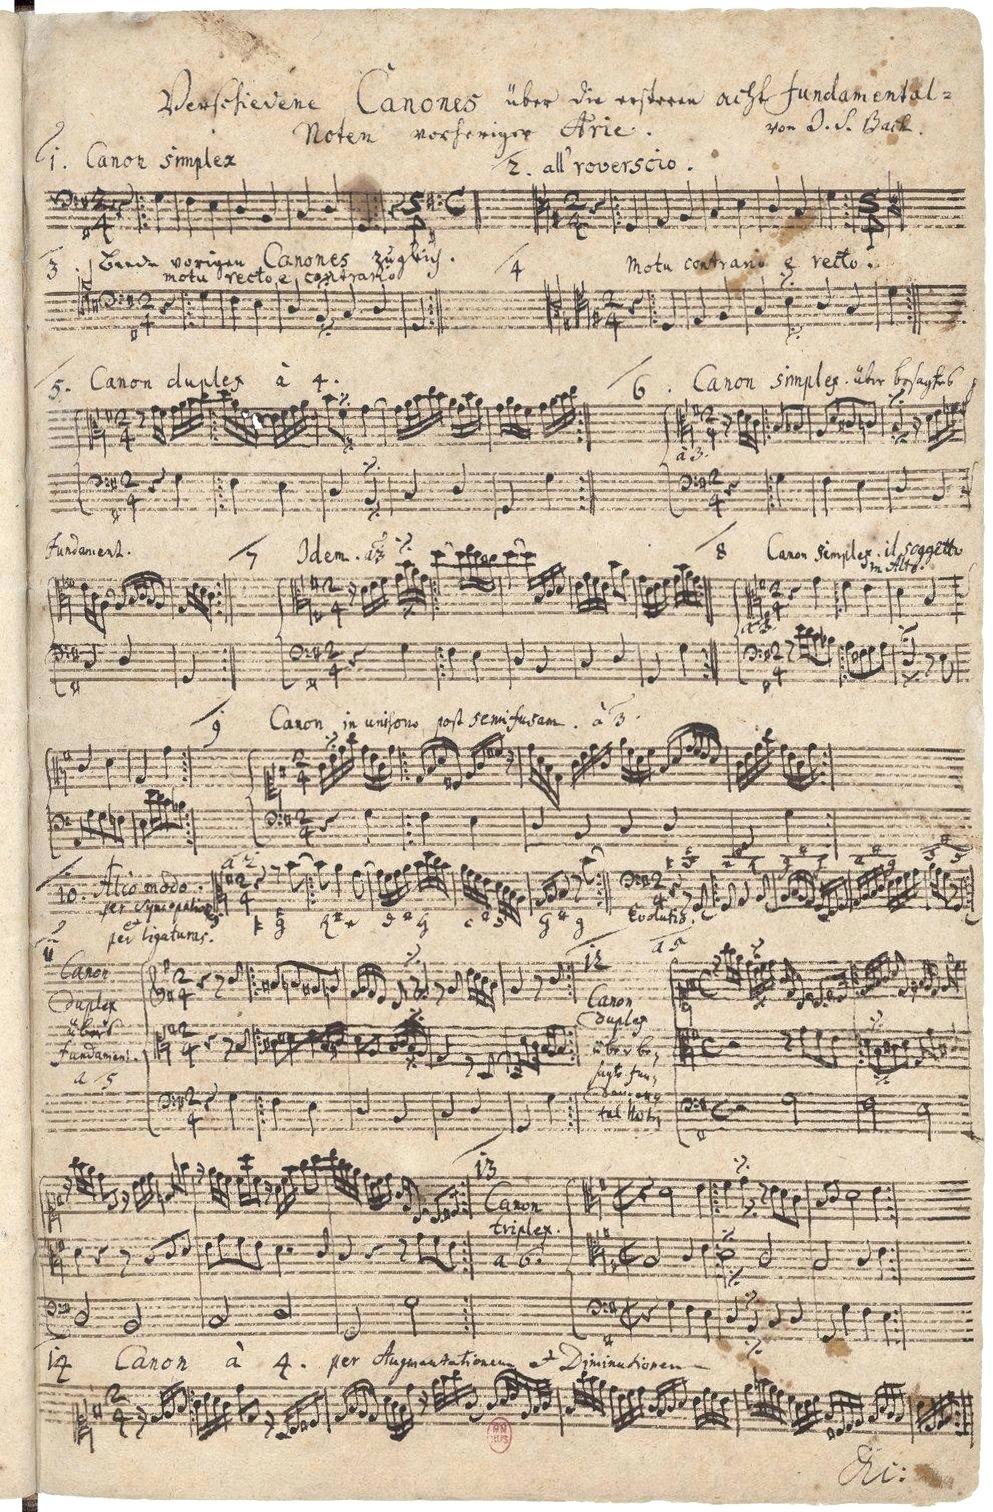 J.S. Bach, Verschiedene Canones über die ersten acht Fundamental-Noten vorheriger Arie (Various Canons on the First Eight Fundamental Notes of the First Aria), from the Goldberg Variations, BWV 1087, composed between 1741 and 1750, discovered in Bach's own copy of the Variations in 1974. The score is stored at Bibliothèque Nationale de Paris.